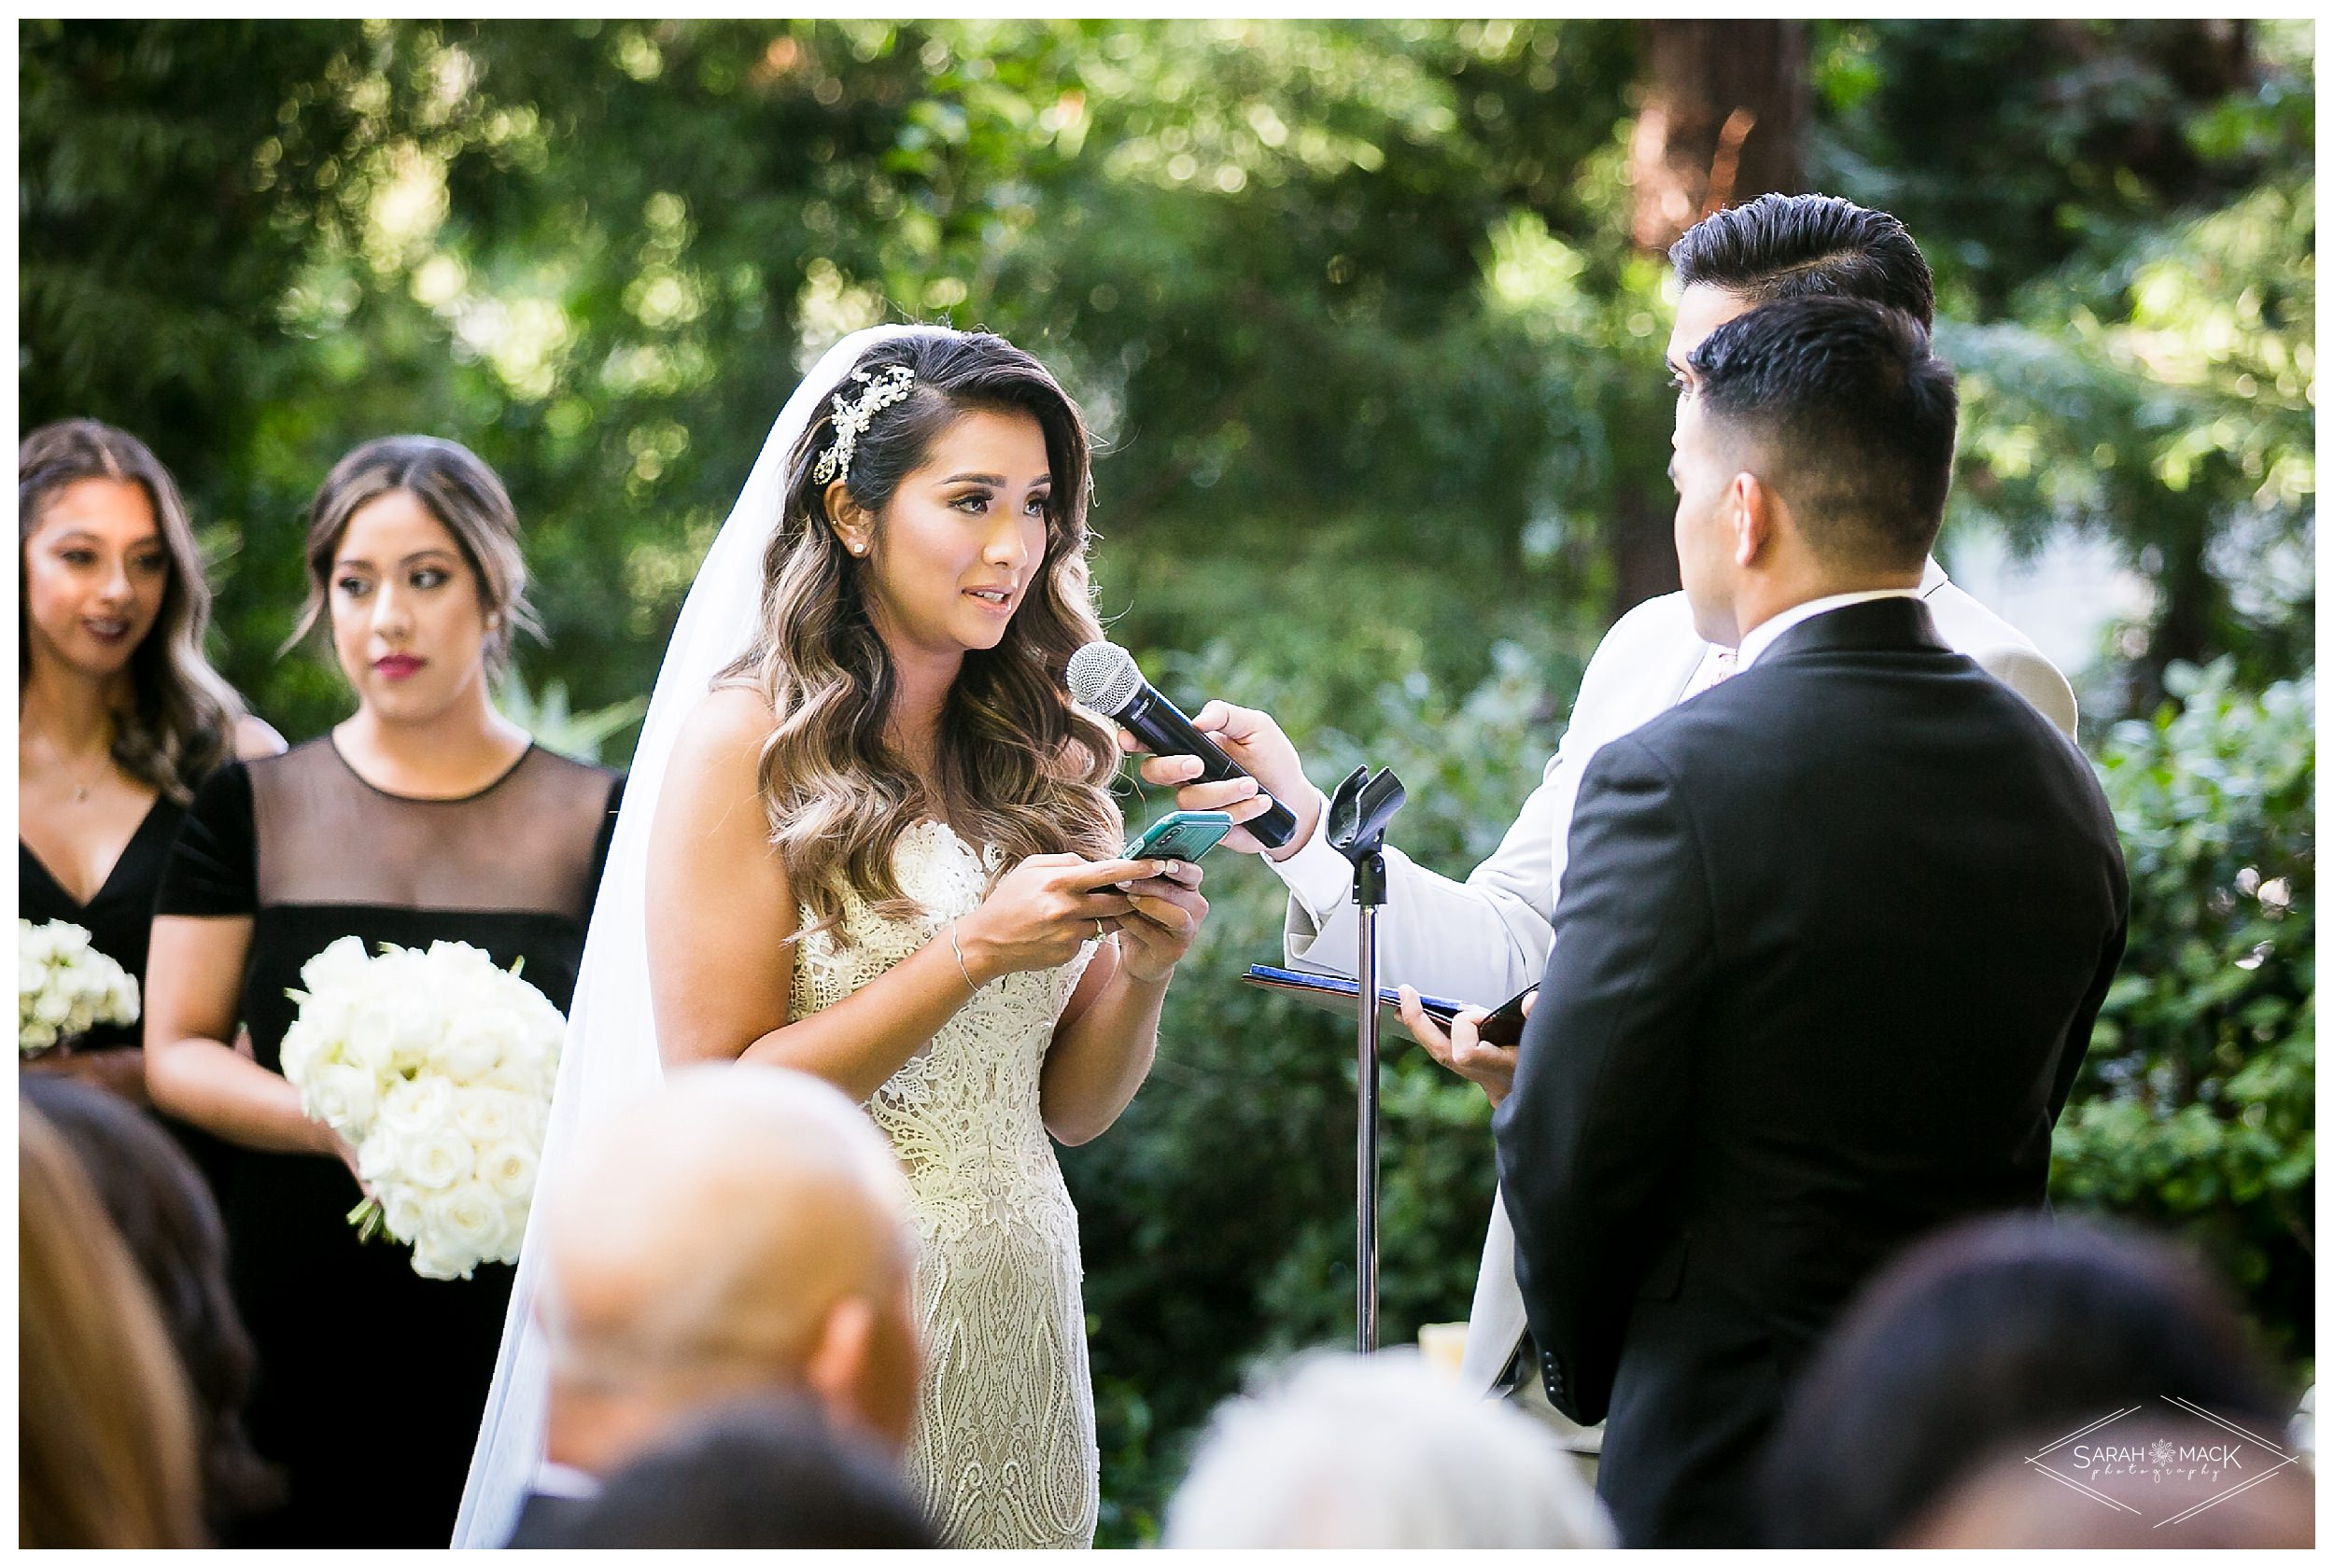 LE-Avenue-of-the-Arts-Costa-Mesa-Wedding-Photography-0153.jpg